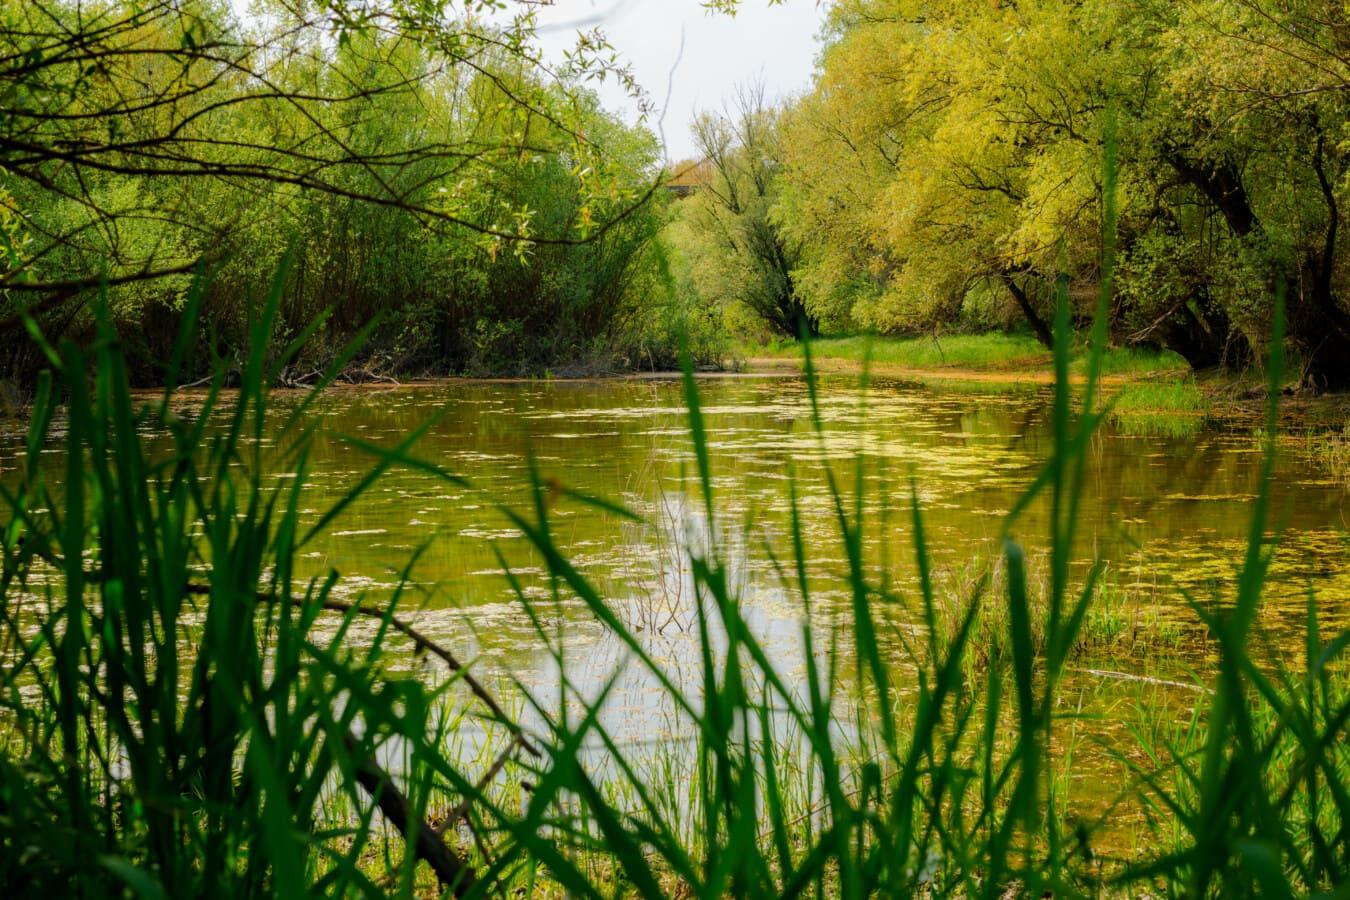 Struktur, Land, Wald, Landschaft, Feuchtgebiet, See, Sumpf, Wasser, Blatt, Natur